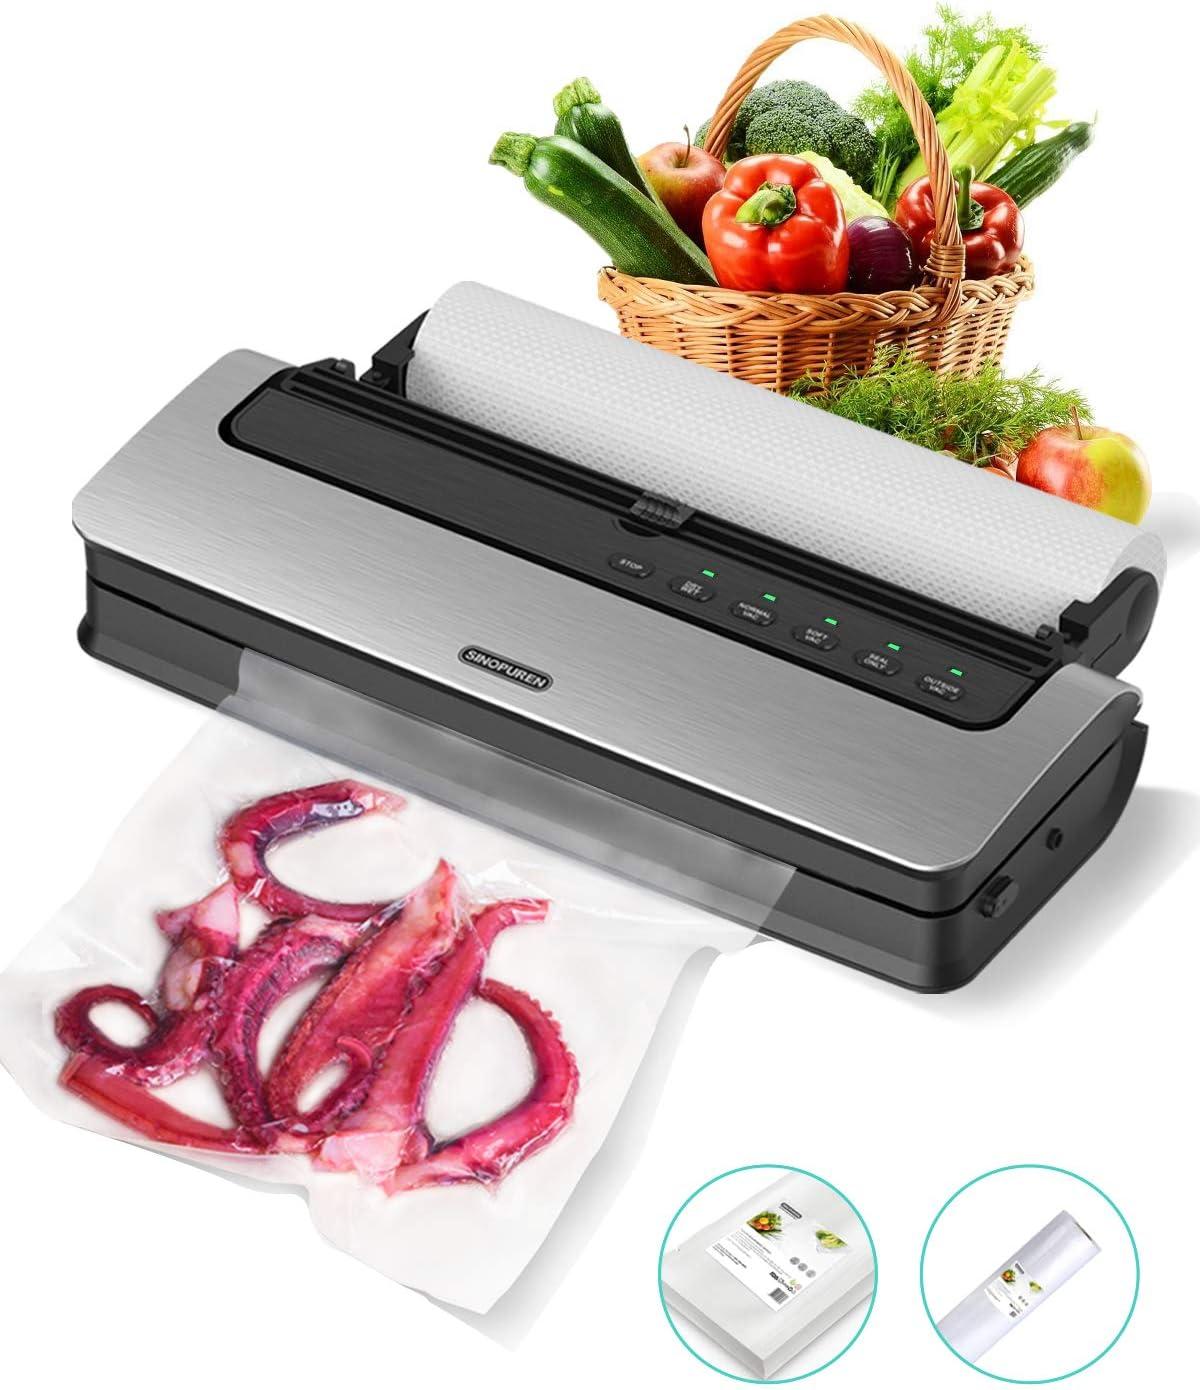 Vacuum Sealer Machine, Sinopuren V63PRO Automatic Vacuum Food Saver Machine Air Sealing System For Food Preservation with Built-in Cutter, Starter Kit Roll and Holder